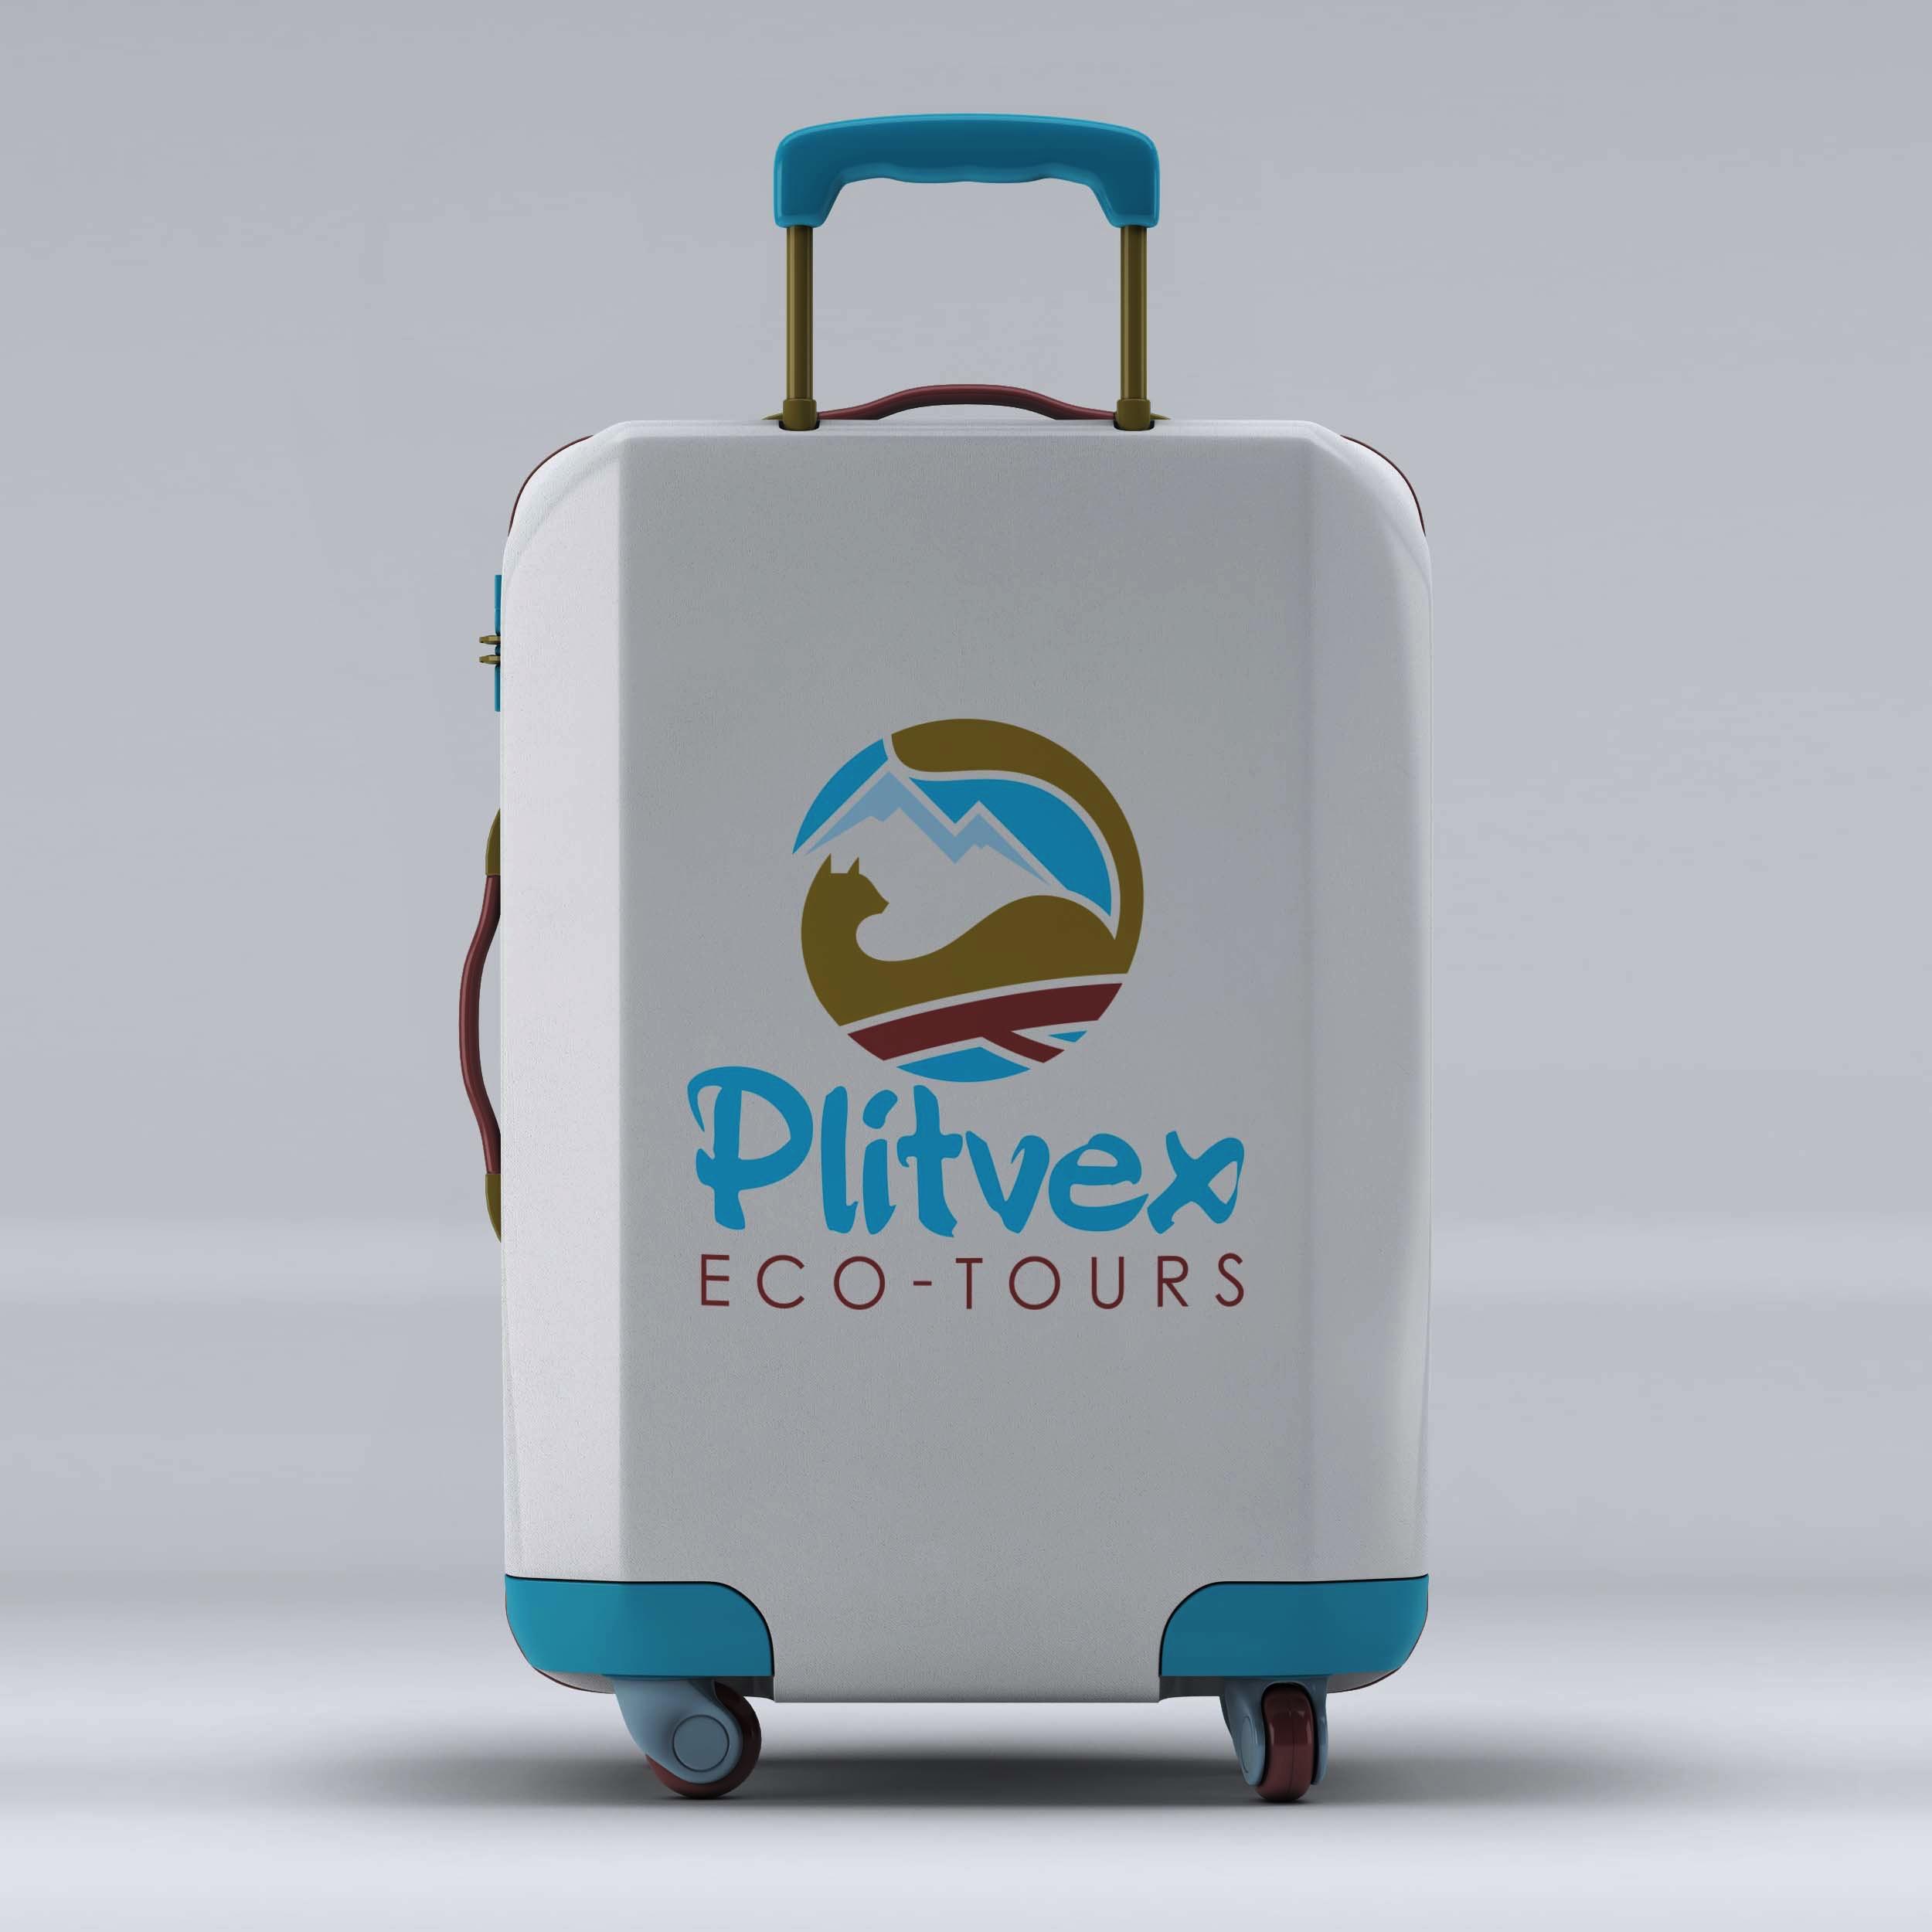 Plitvex